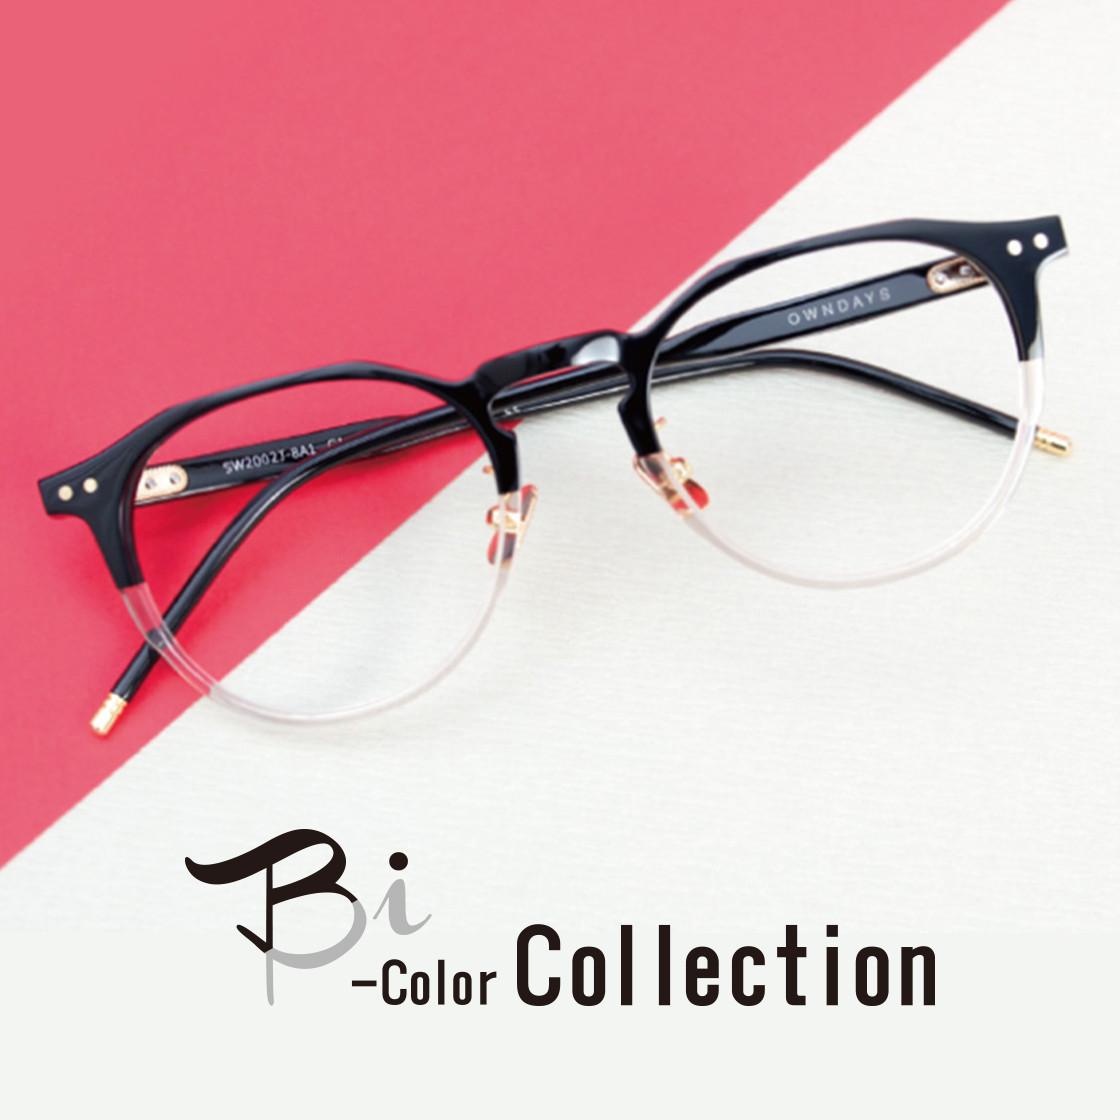 Bi-Color Collection